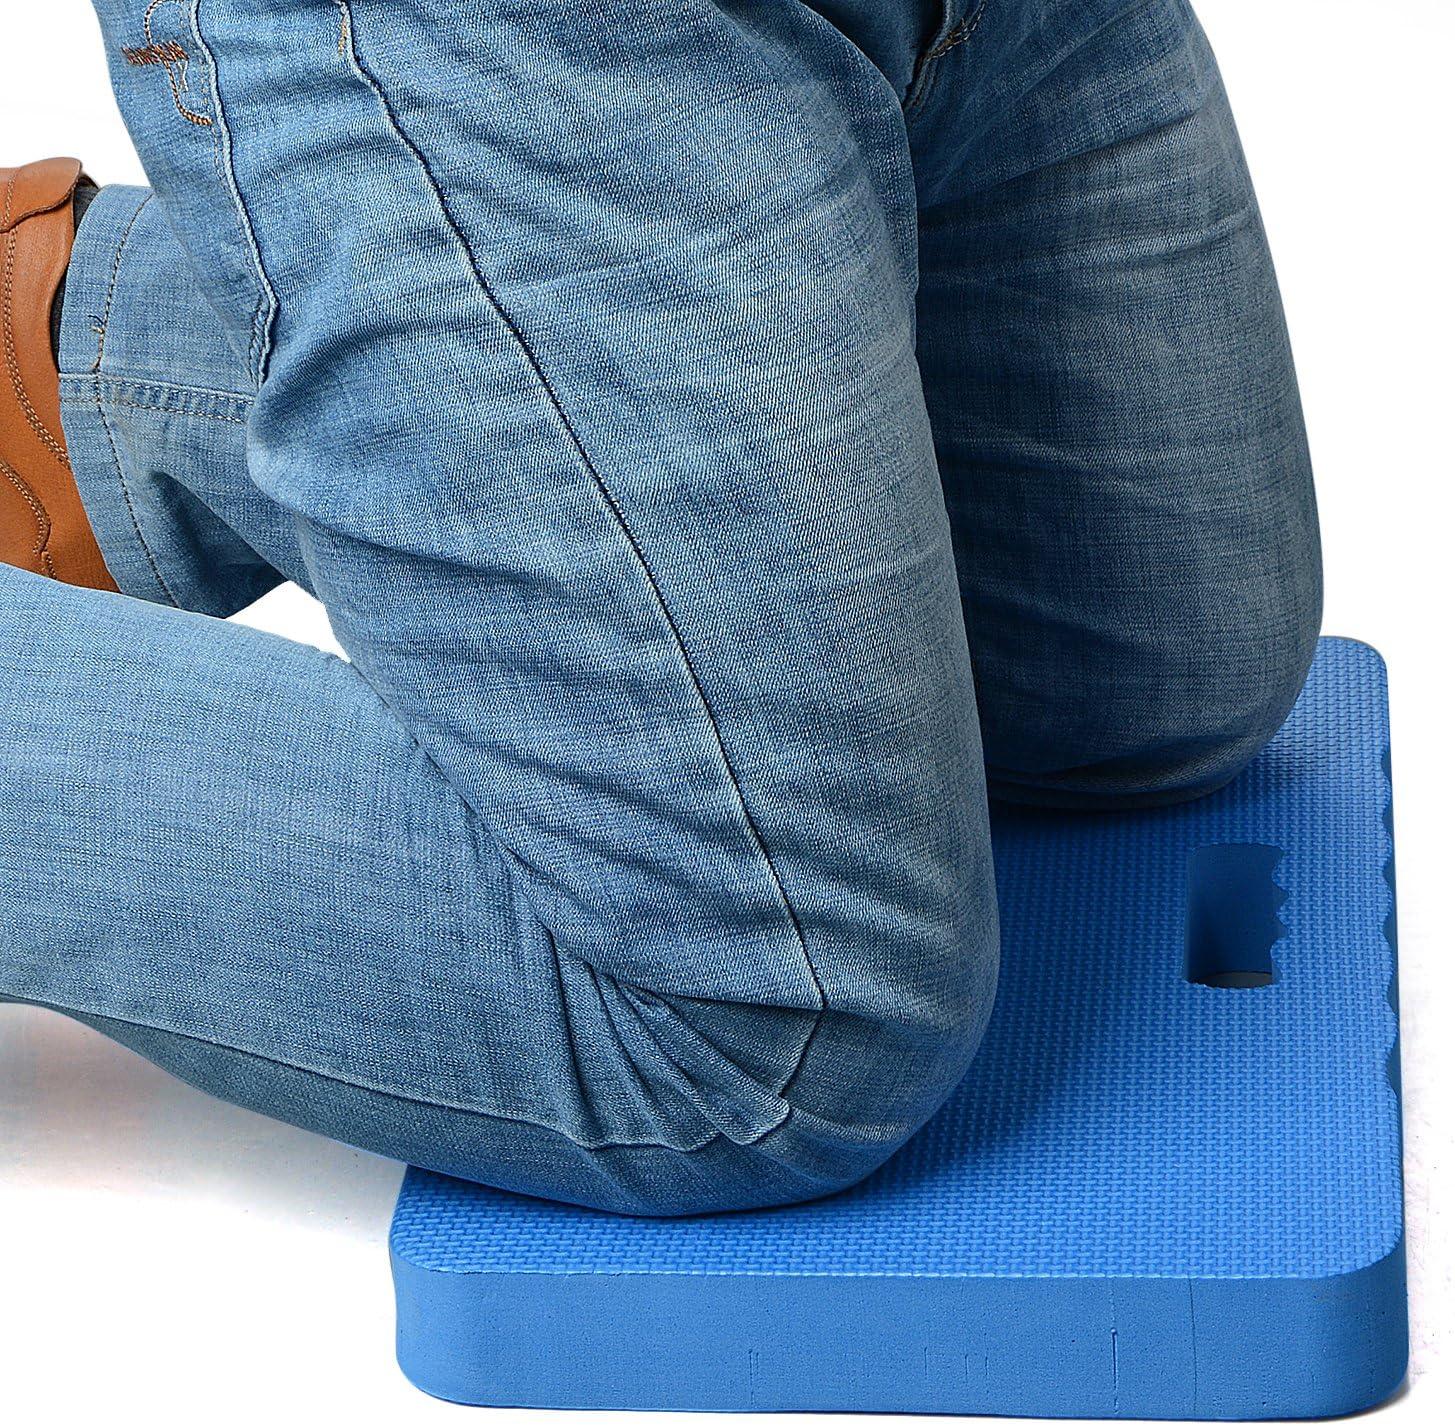 Yoga And More LouisaYork Kneeling Pad Garden Kneeler,Kneeling Pad,High Density EVA,Multi Functional,for Gardening Exercise Baby Bathing